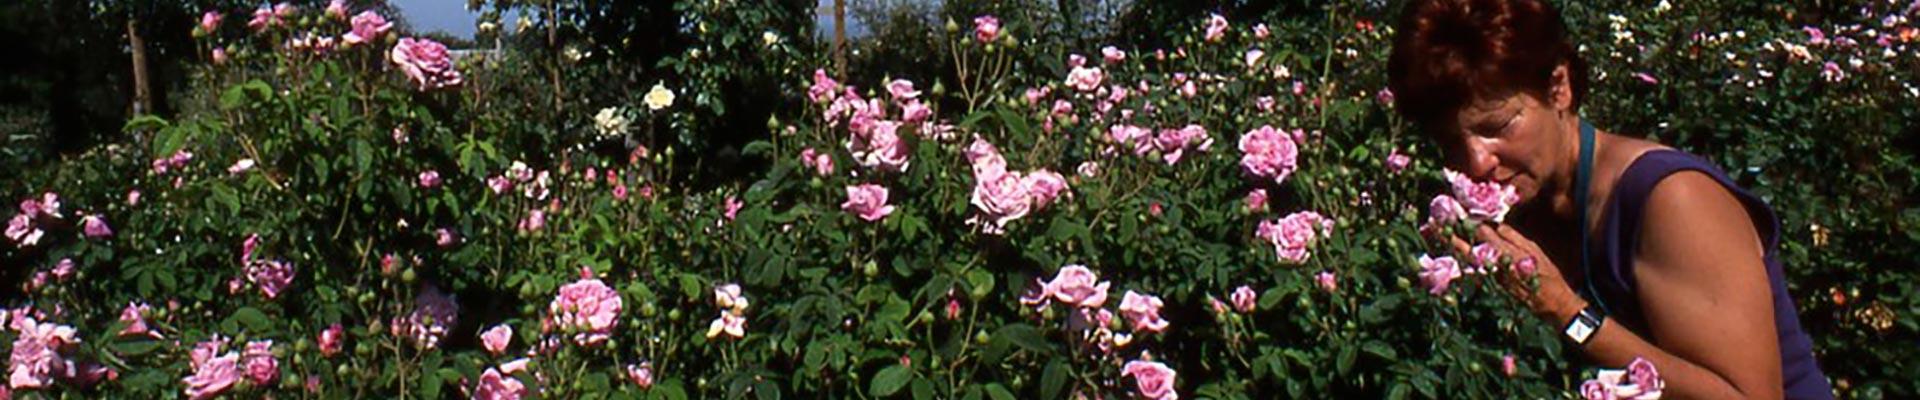 Giardino botanico Case Basse - Soldera